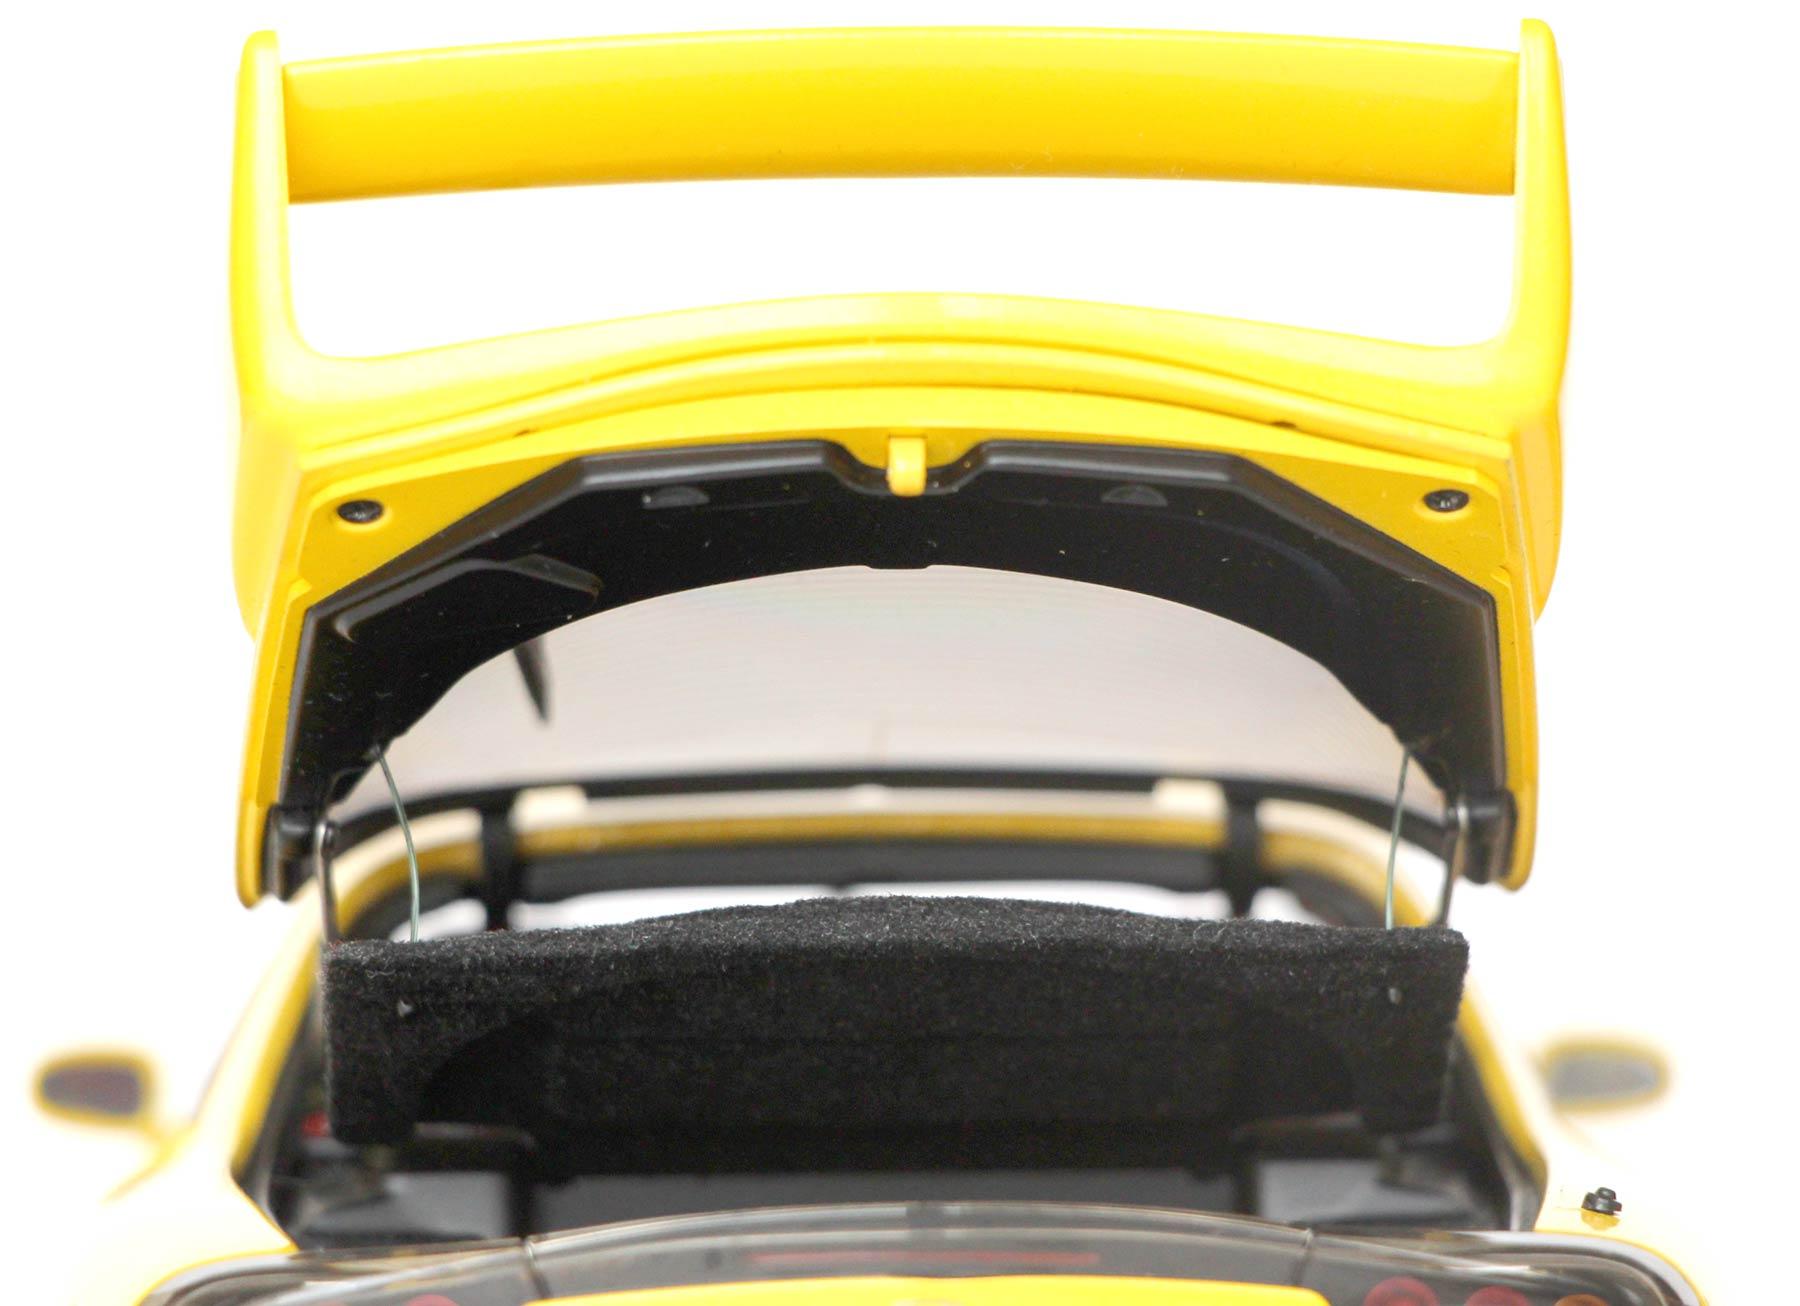 Garniture du haillon de la Mazda RX 7 AUTOart ech 1/18 - Initial D